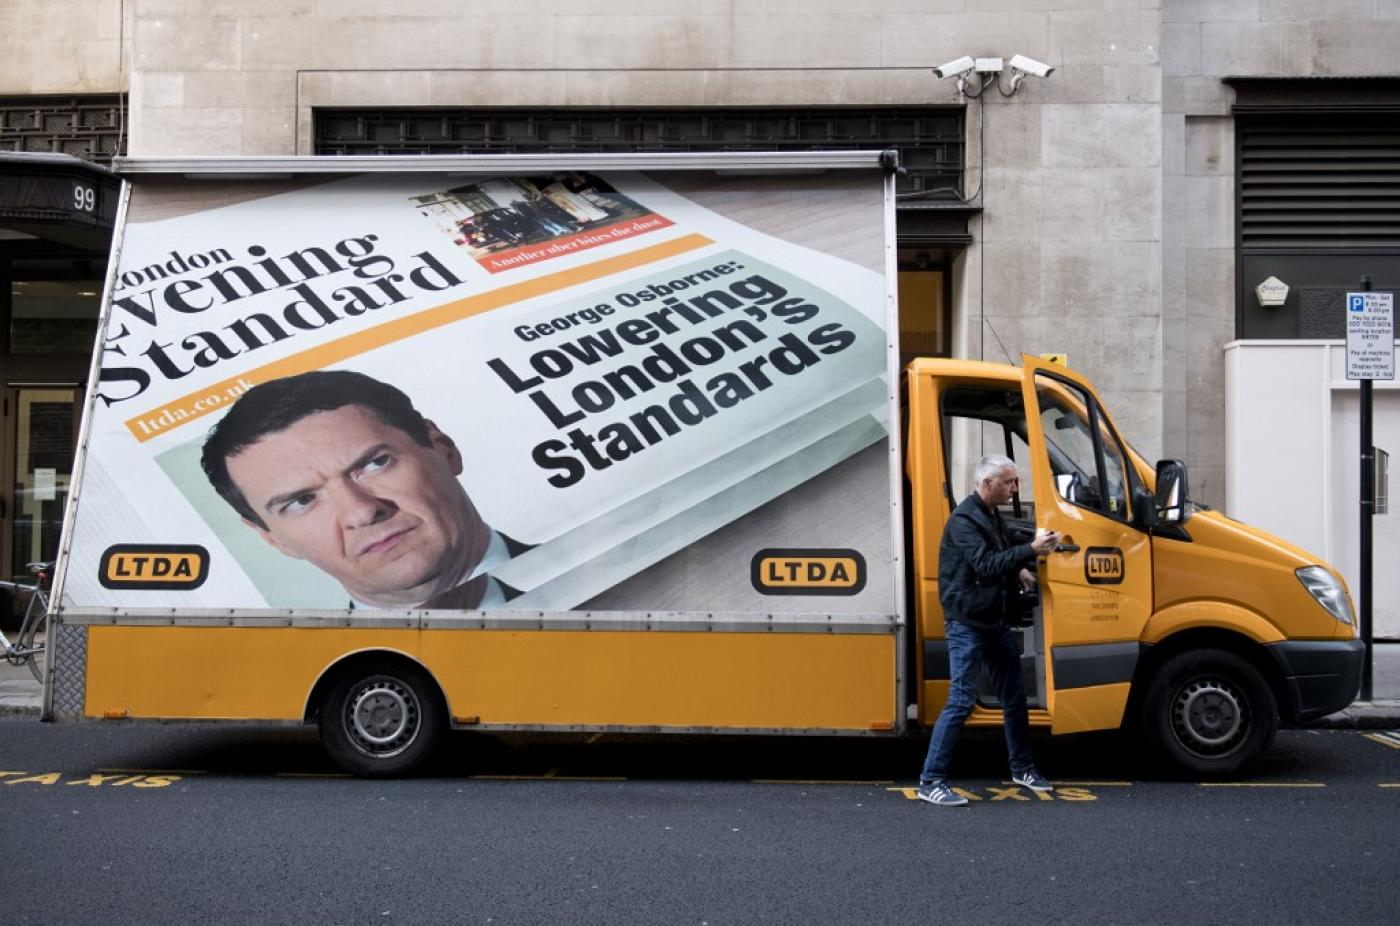 How mainstream media fuels the UK's Islamophobia crisis